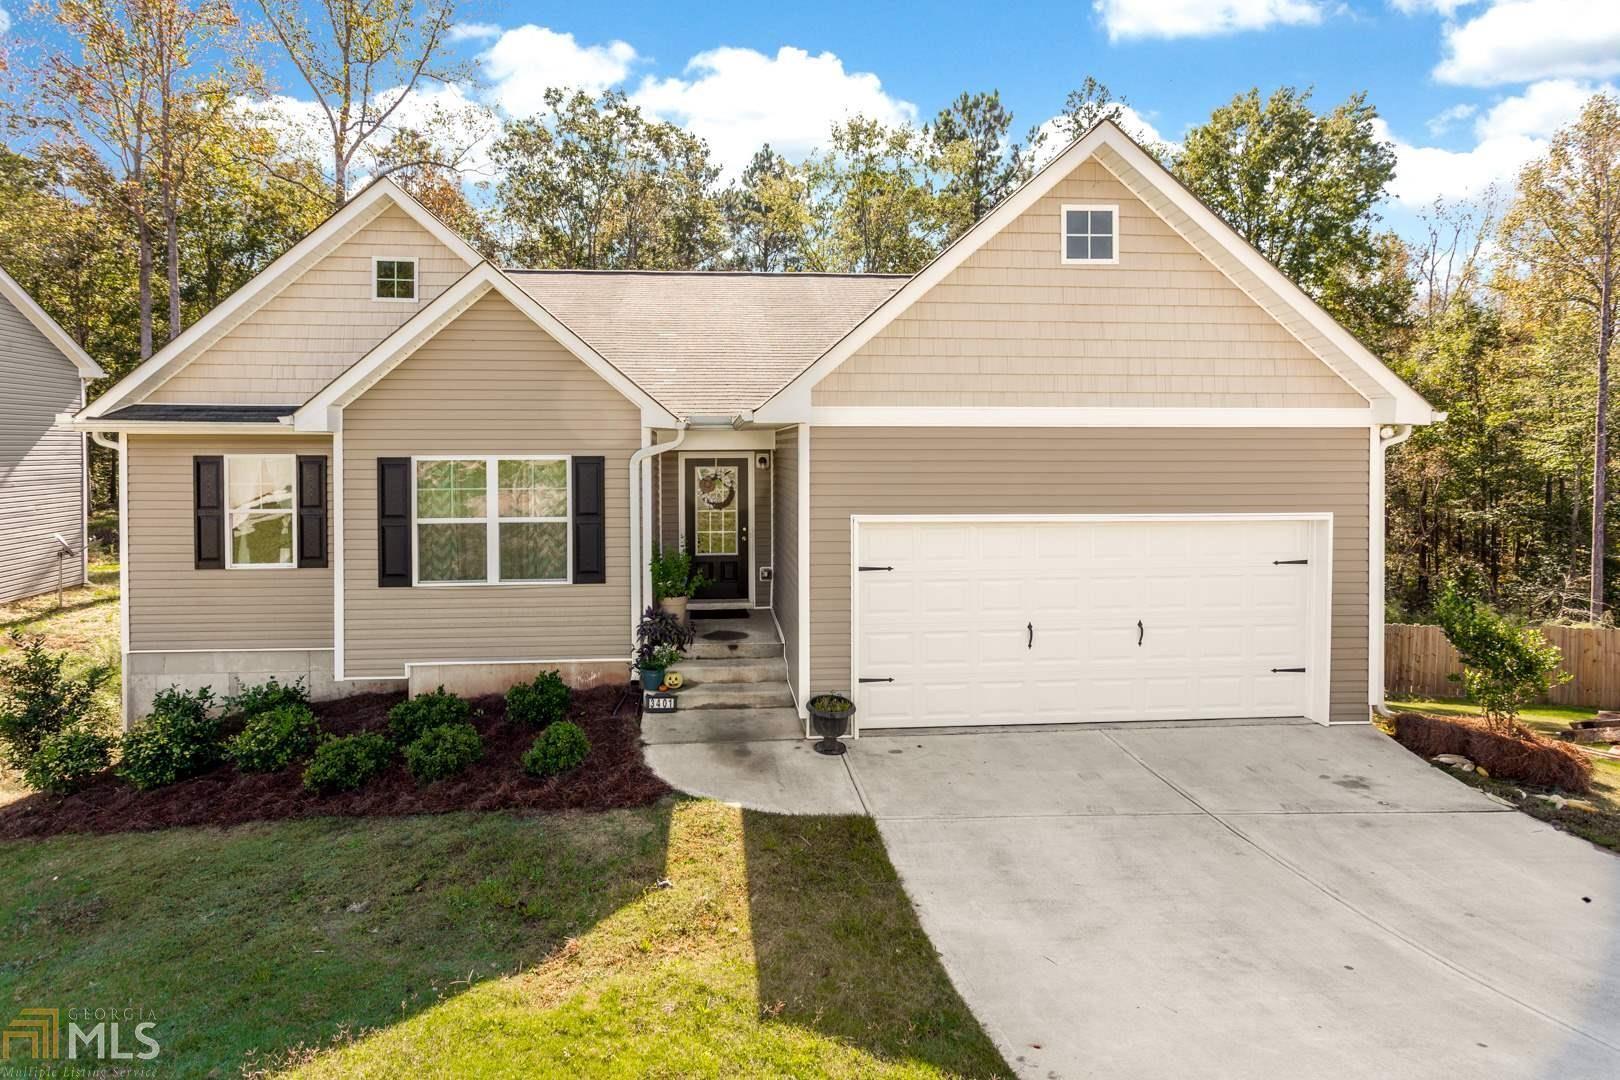 3401 Silver Ridge Dr, Gainesville, GA 30507 - MLS#: 8879937